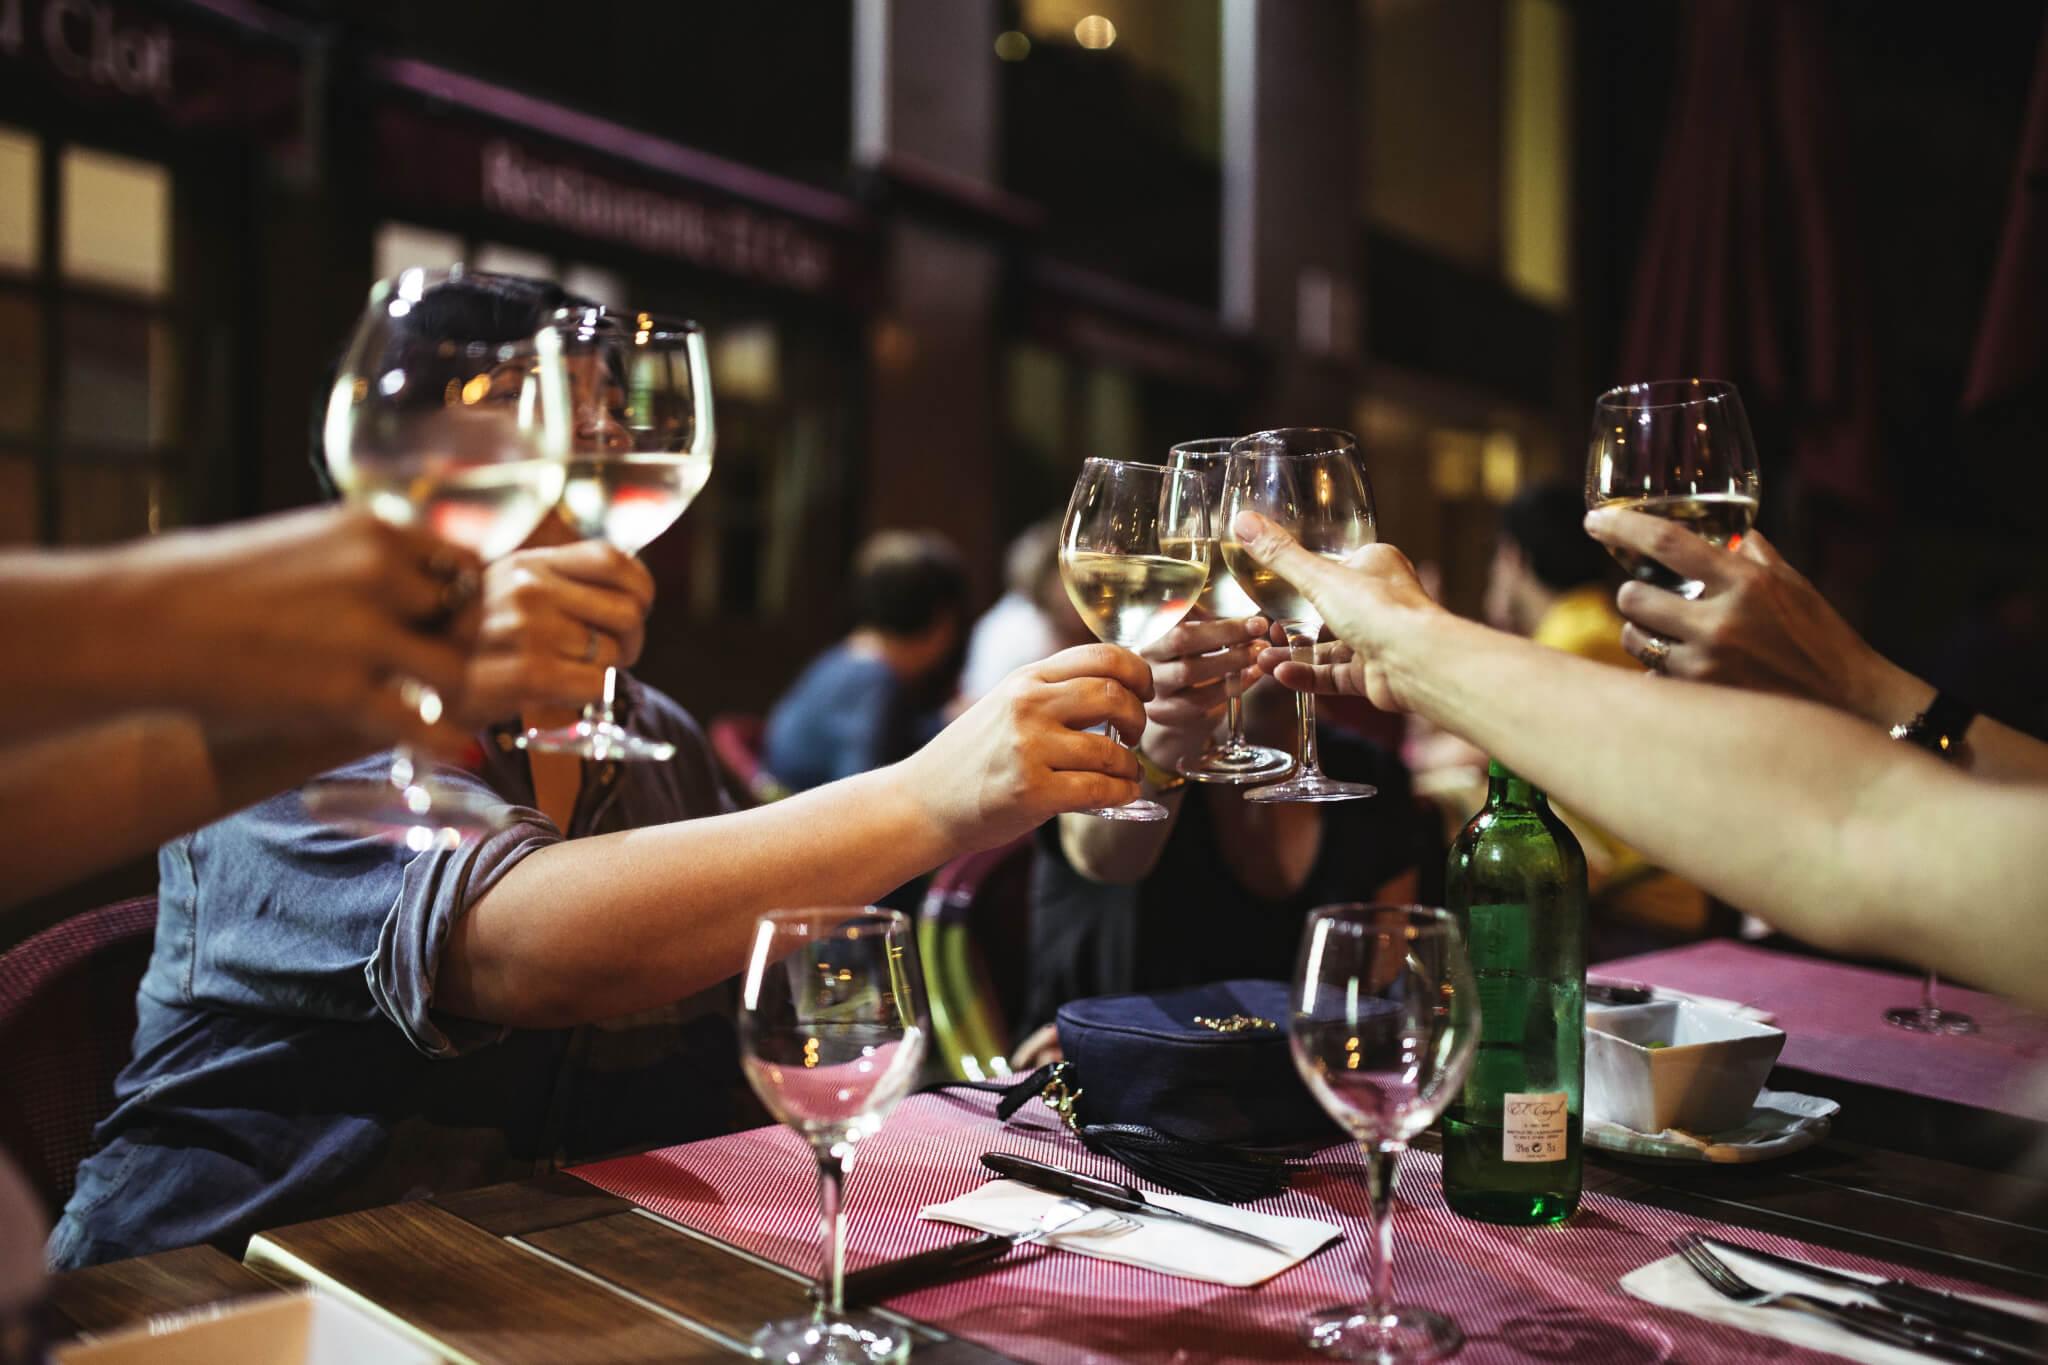 foodiesfeedcom_toast-with-white-wine